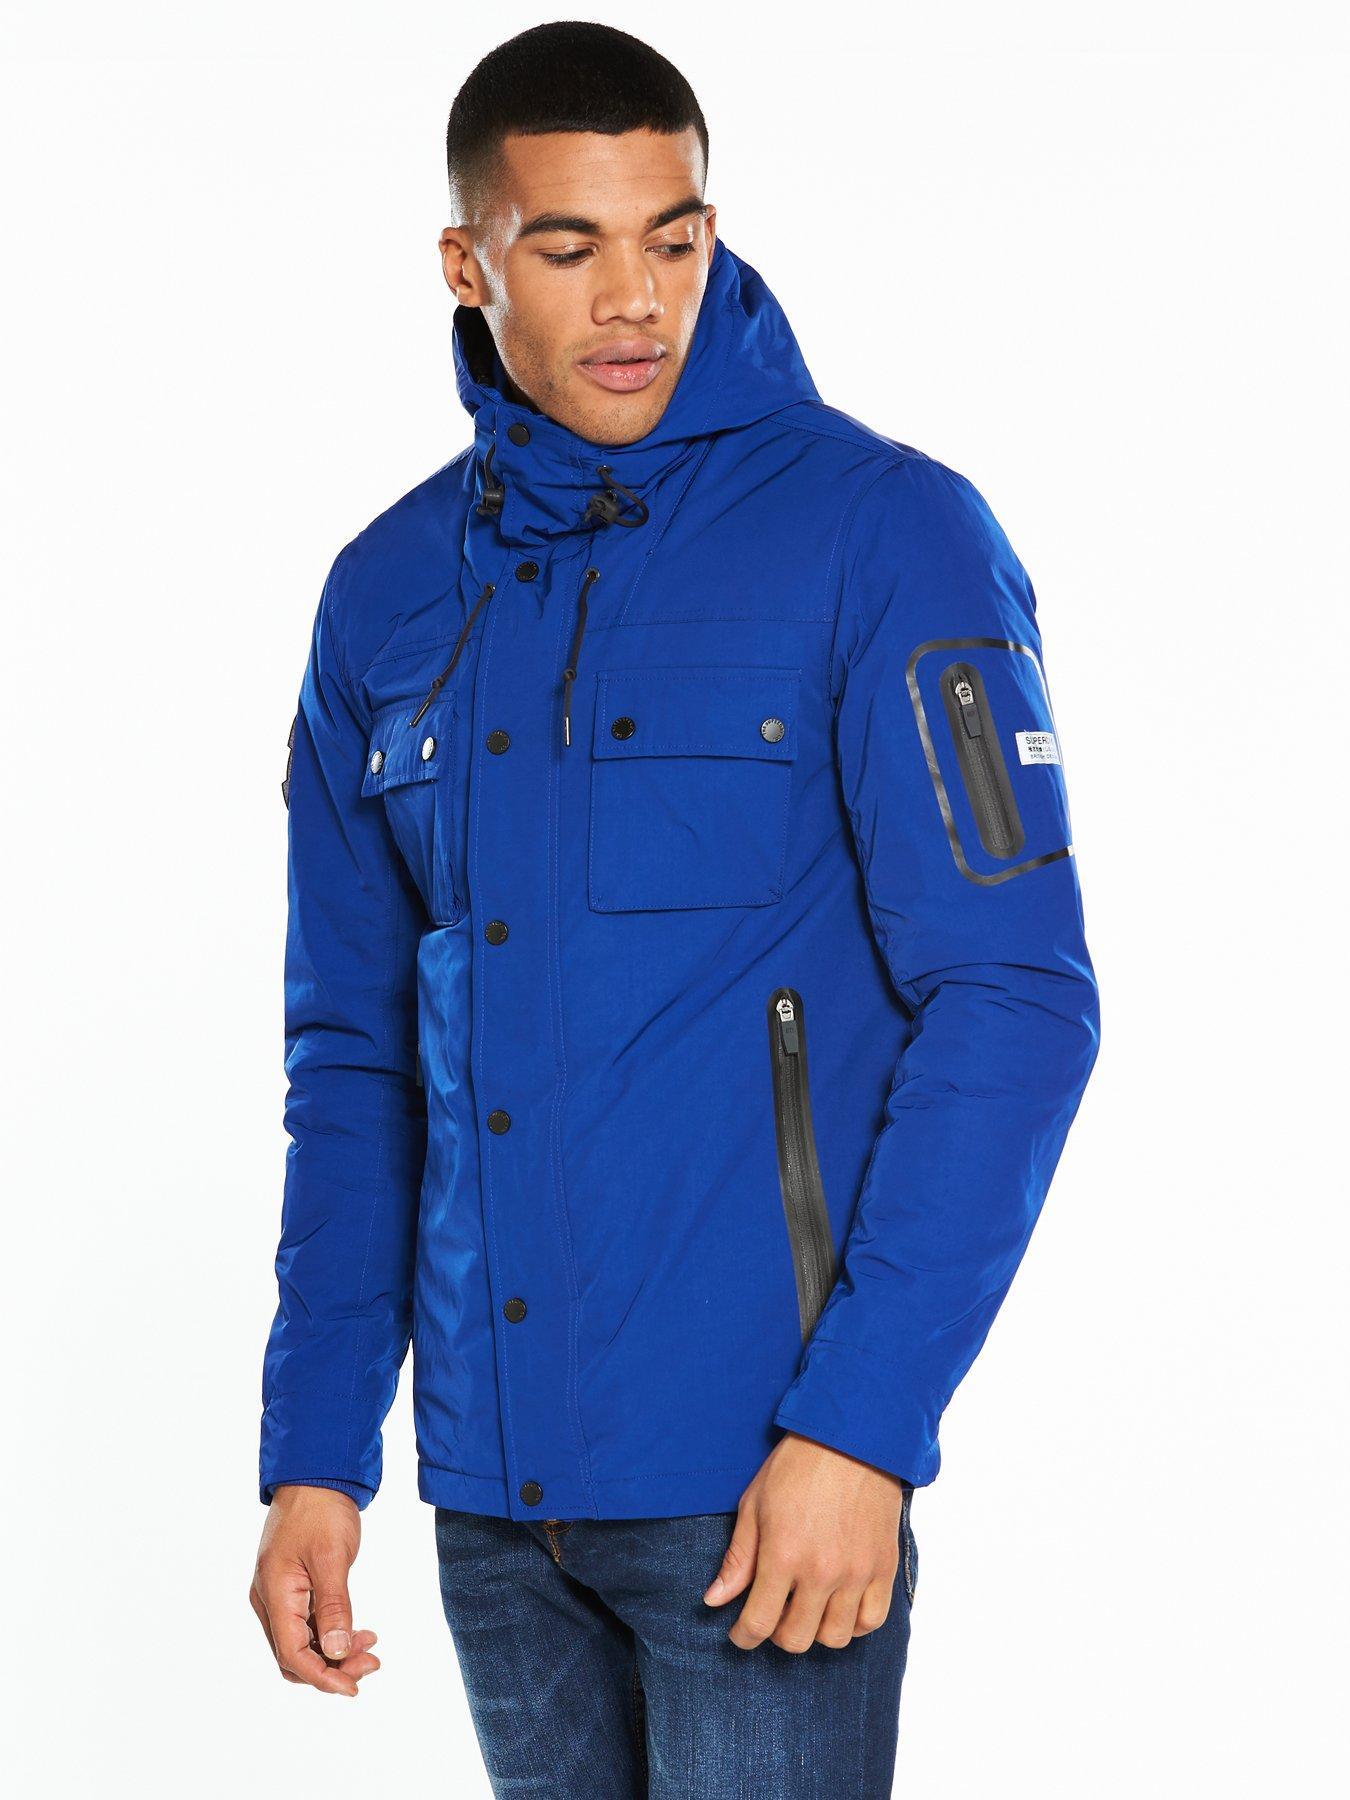 2019 clearance sale distinctive design speical offer Blue Superdry Jackets Littlewoodsireland amp; ie Coats Men ...